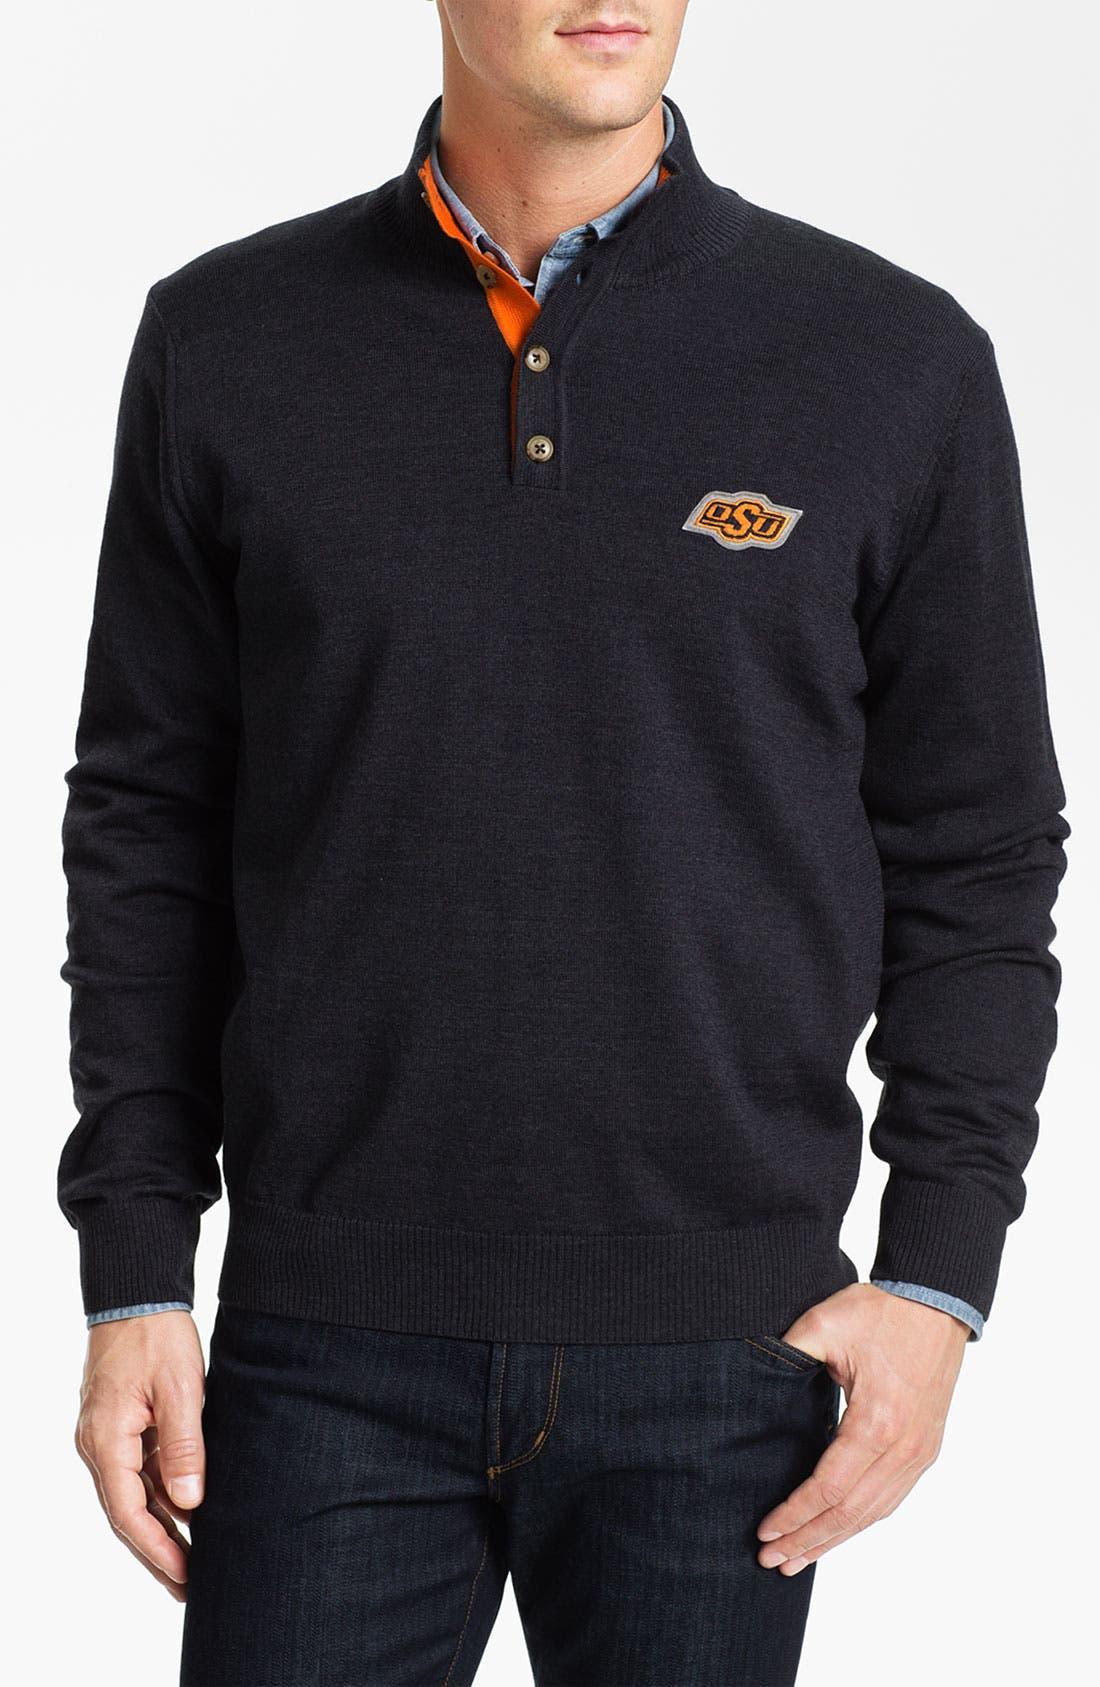 Main Image - Thomas Dean 'Oklahoma State' Wool Sweater